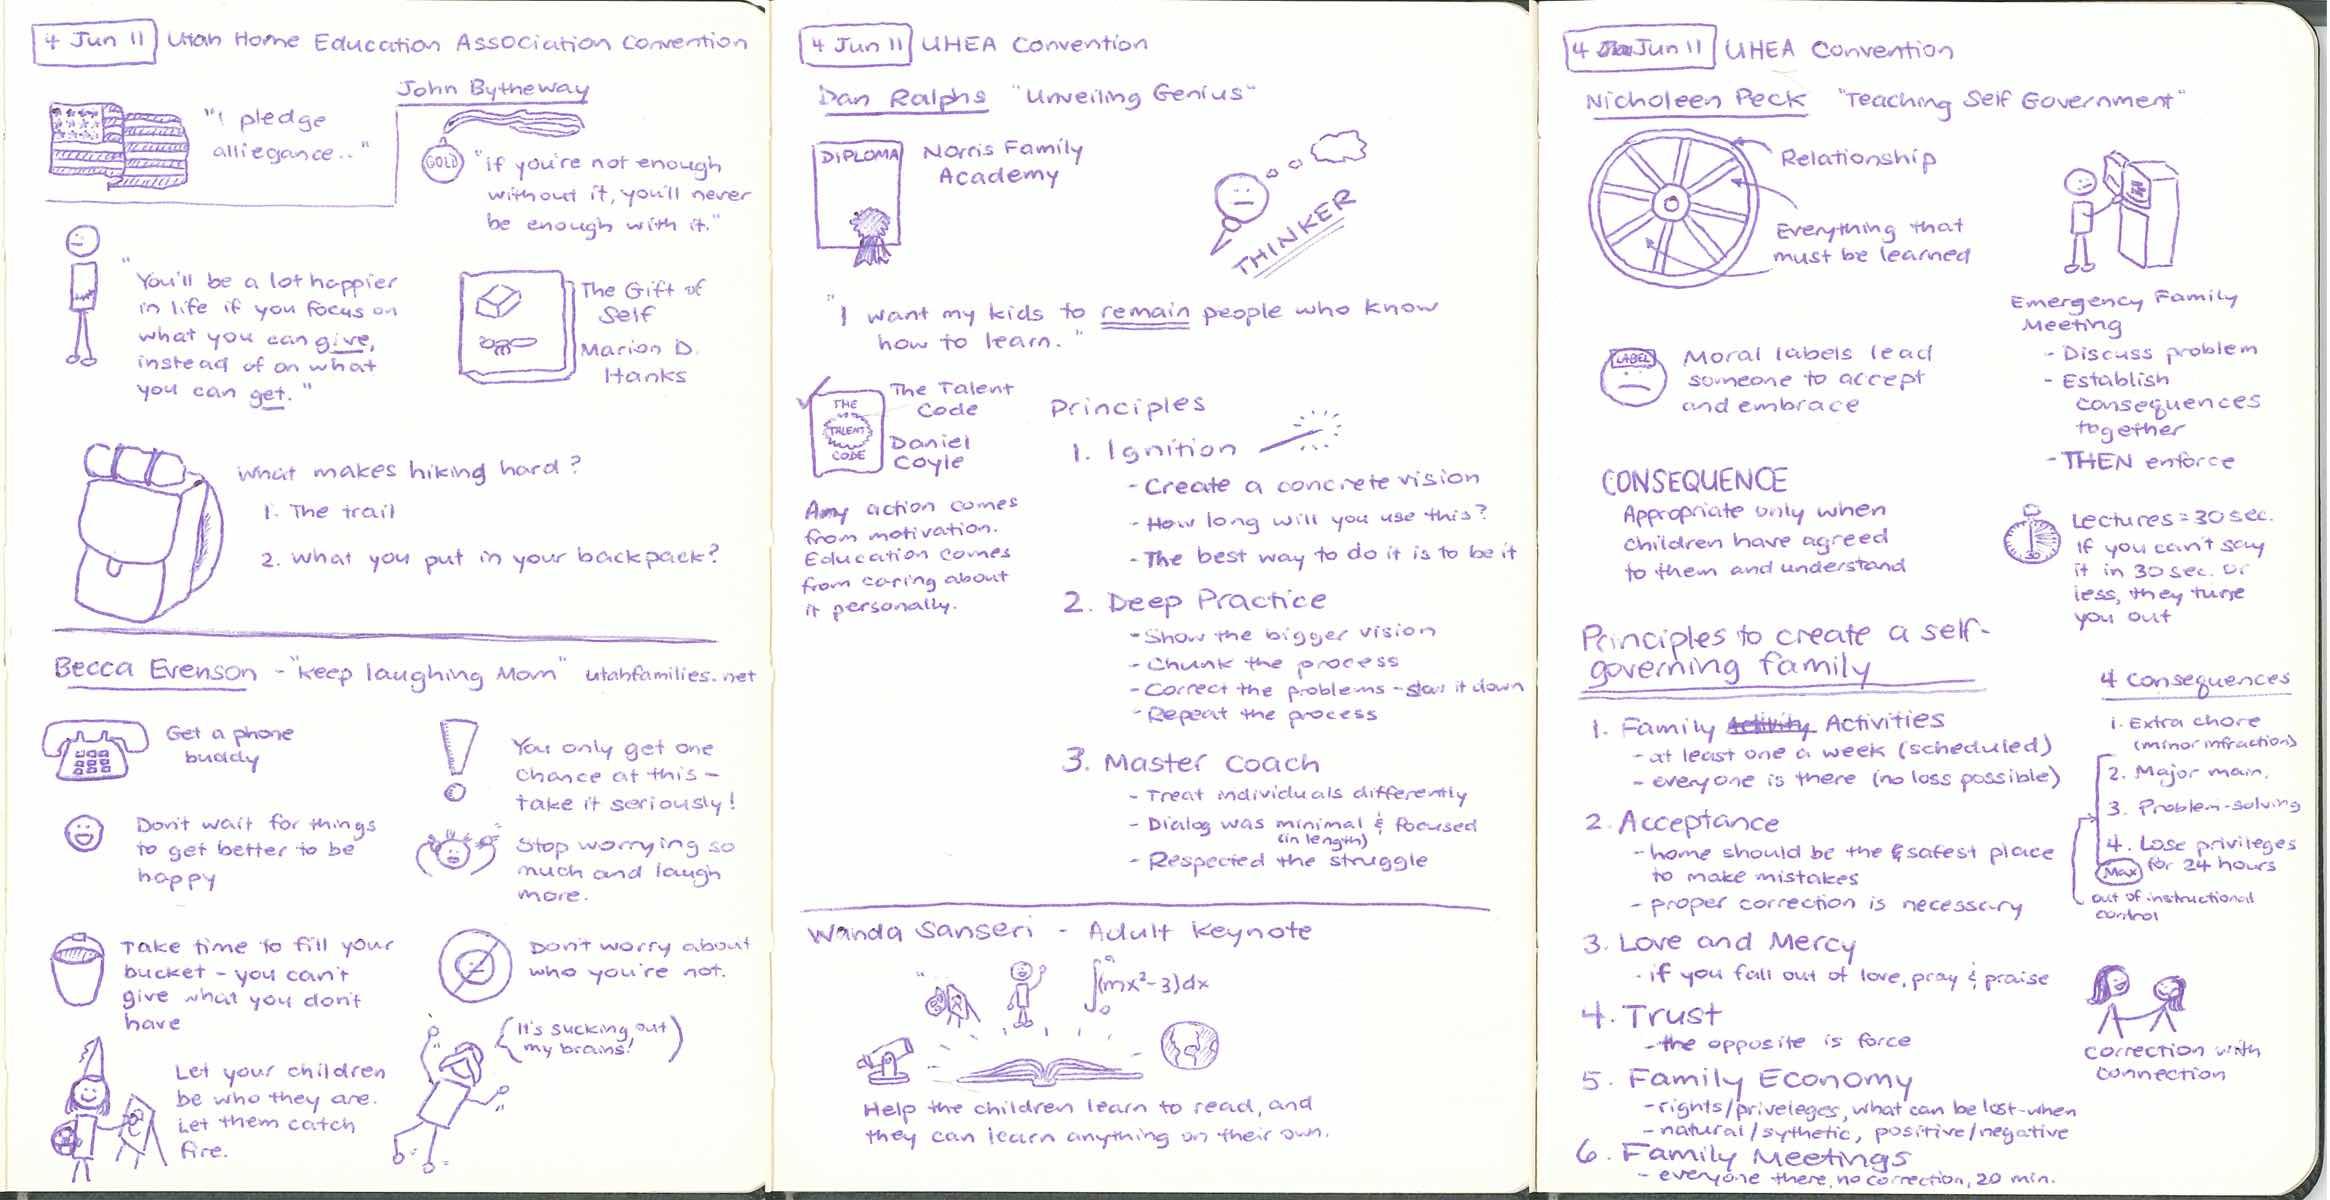 UHEA Convention Sketchnotes 1